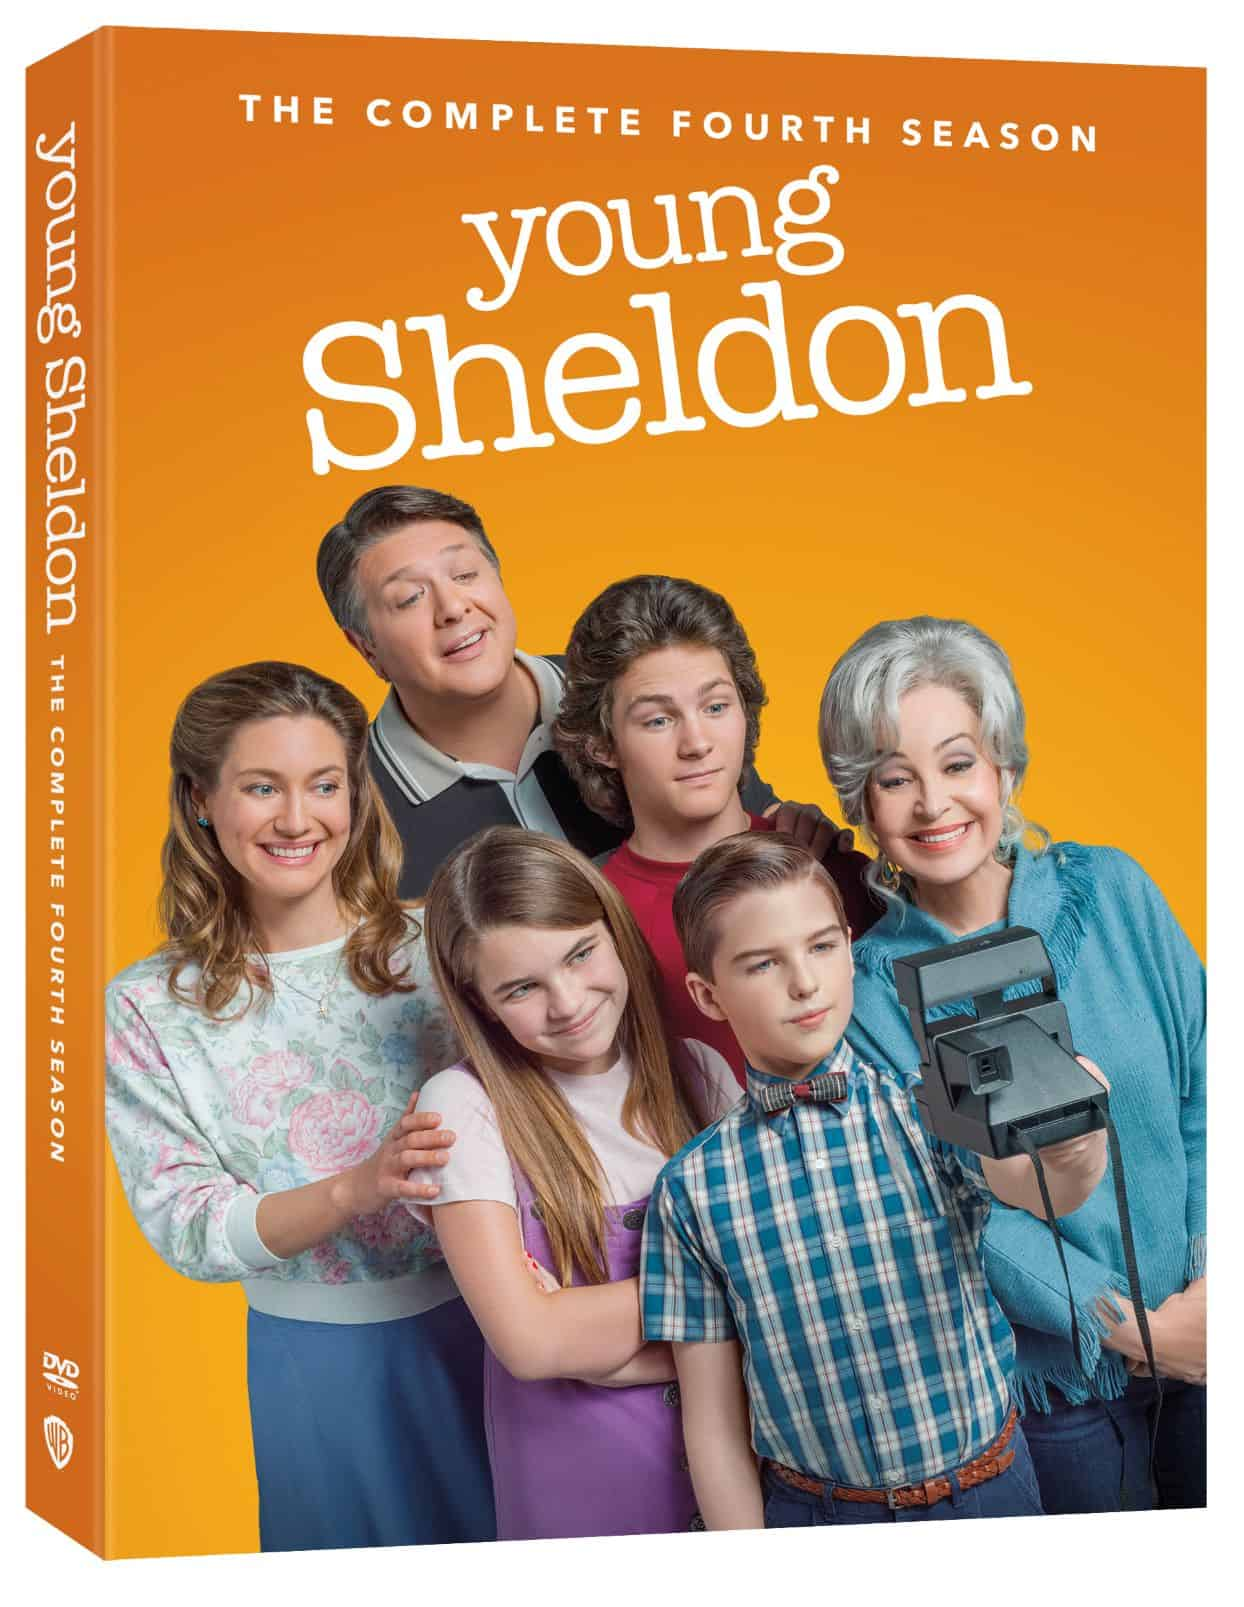 YOUNG SHELDON S4 3D